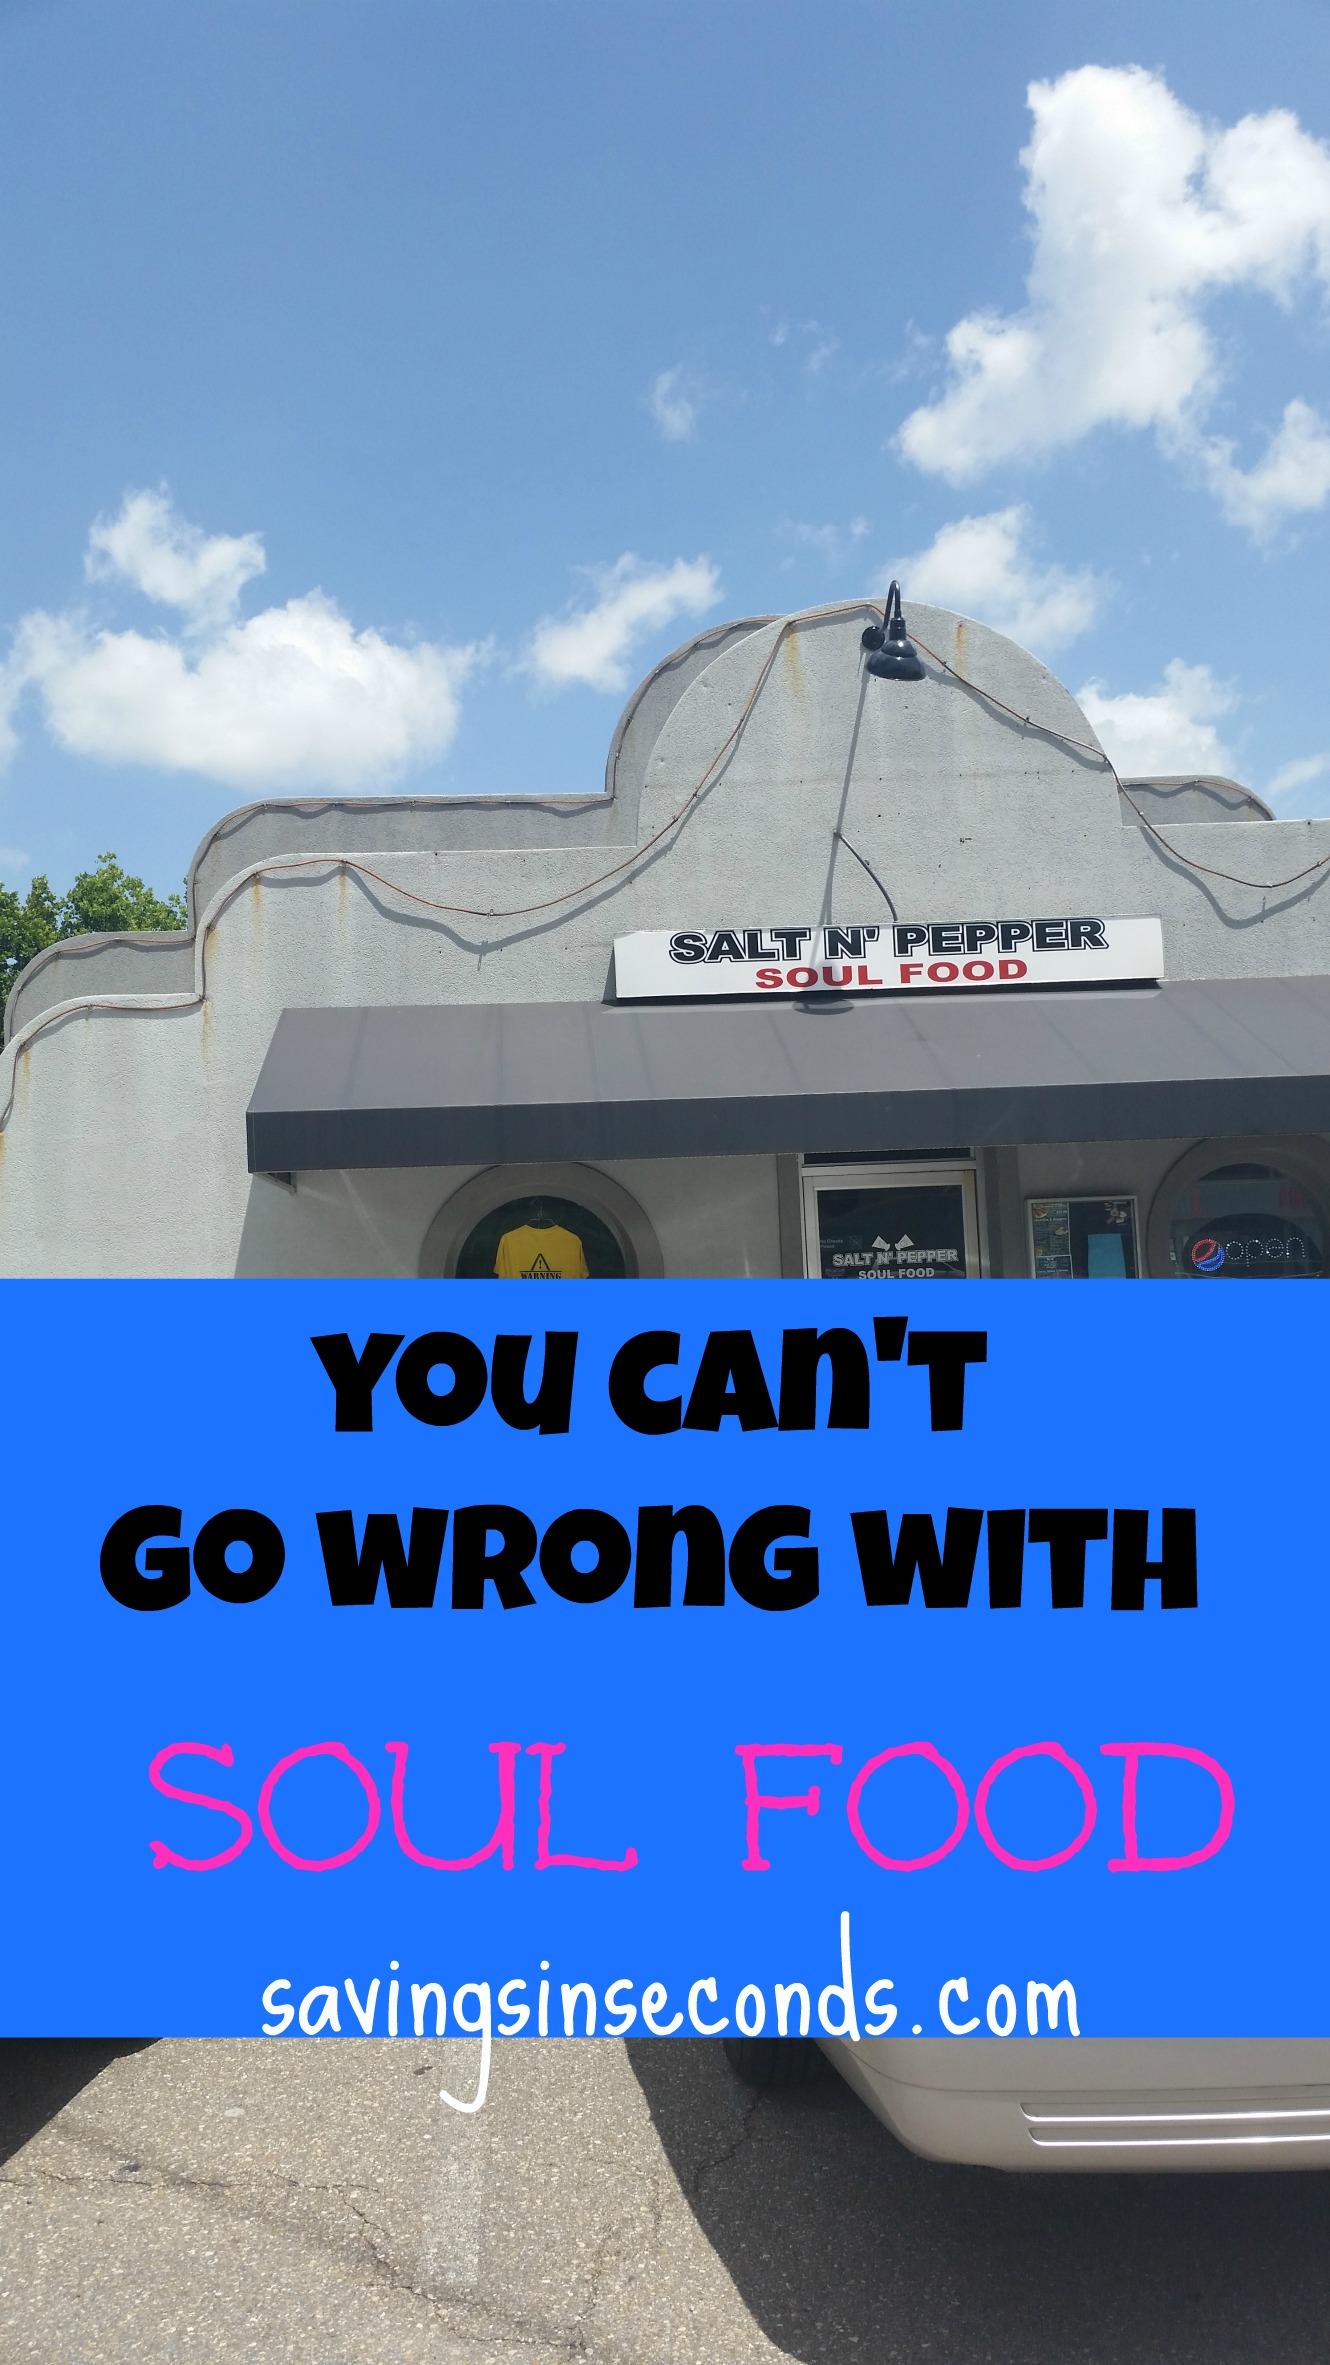 Salt N Pepper restaurant - Johnson City, TN featured on Savingsinseconds.com